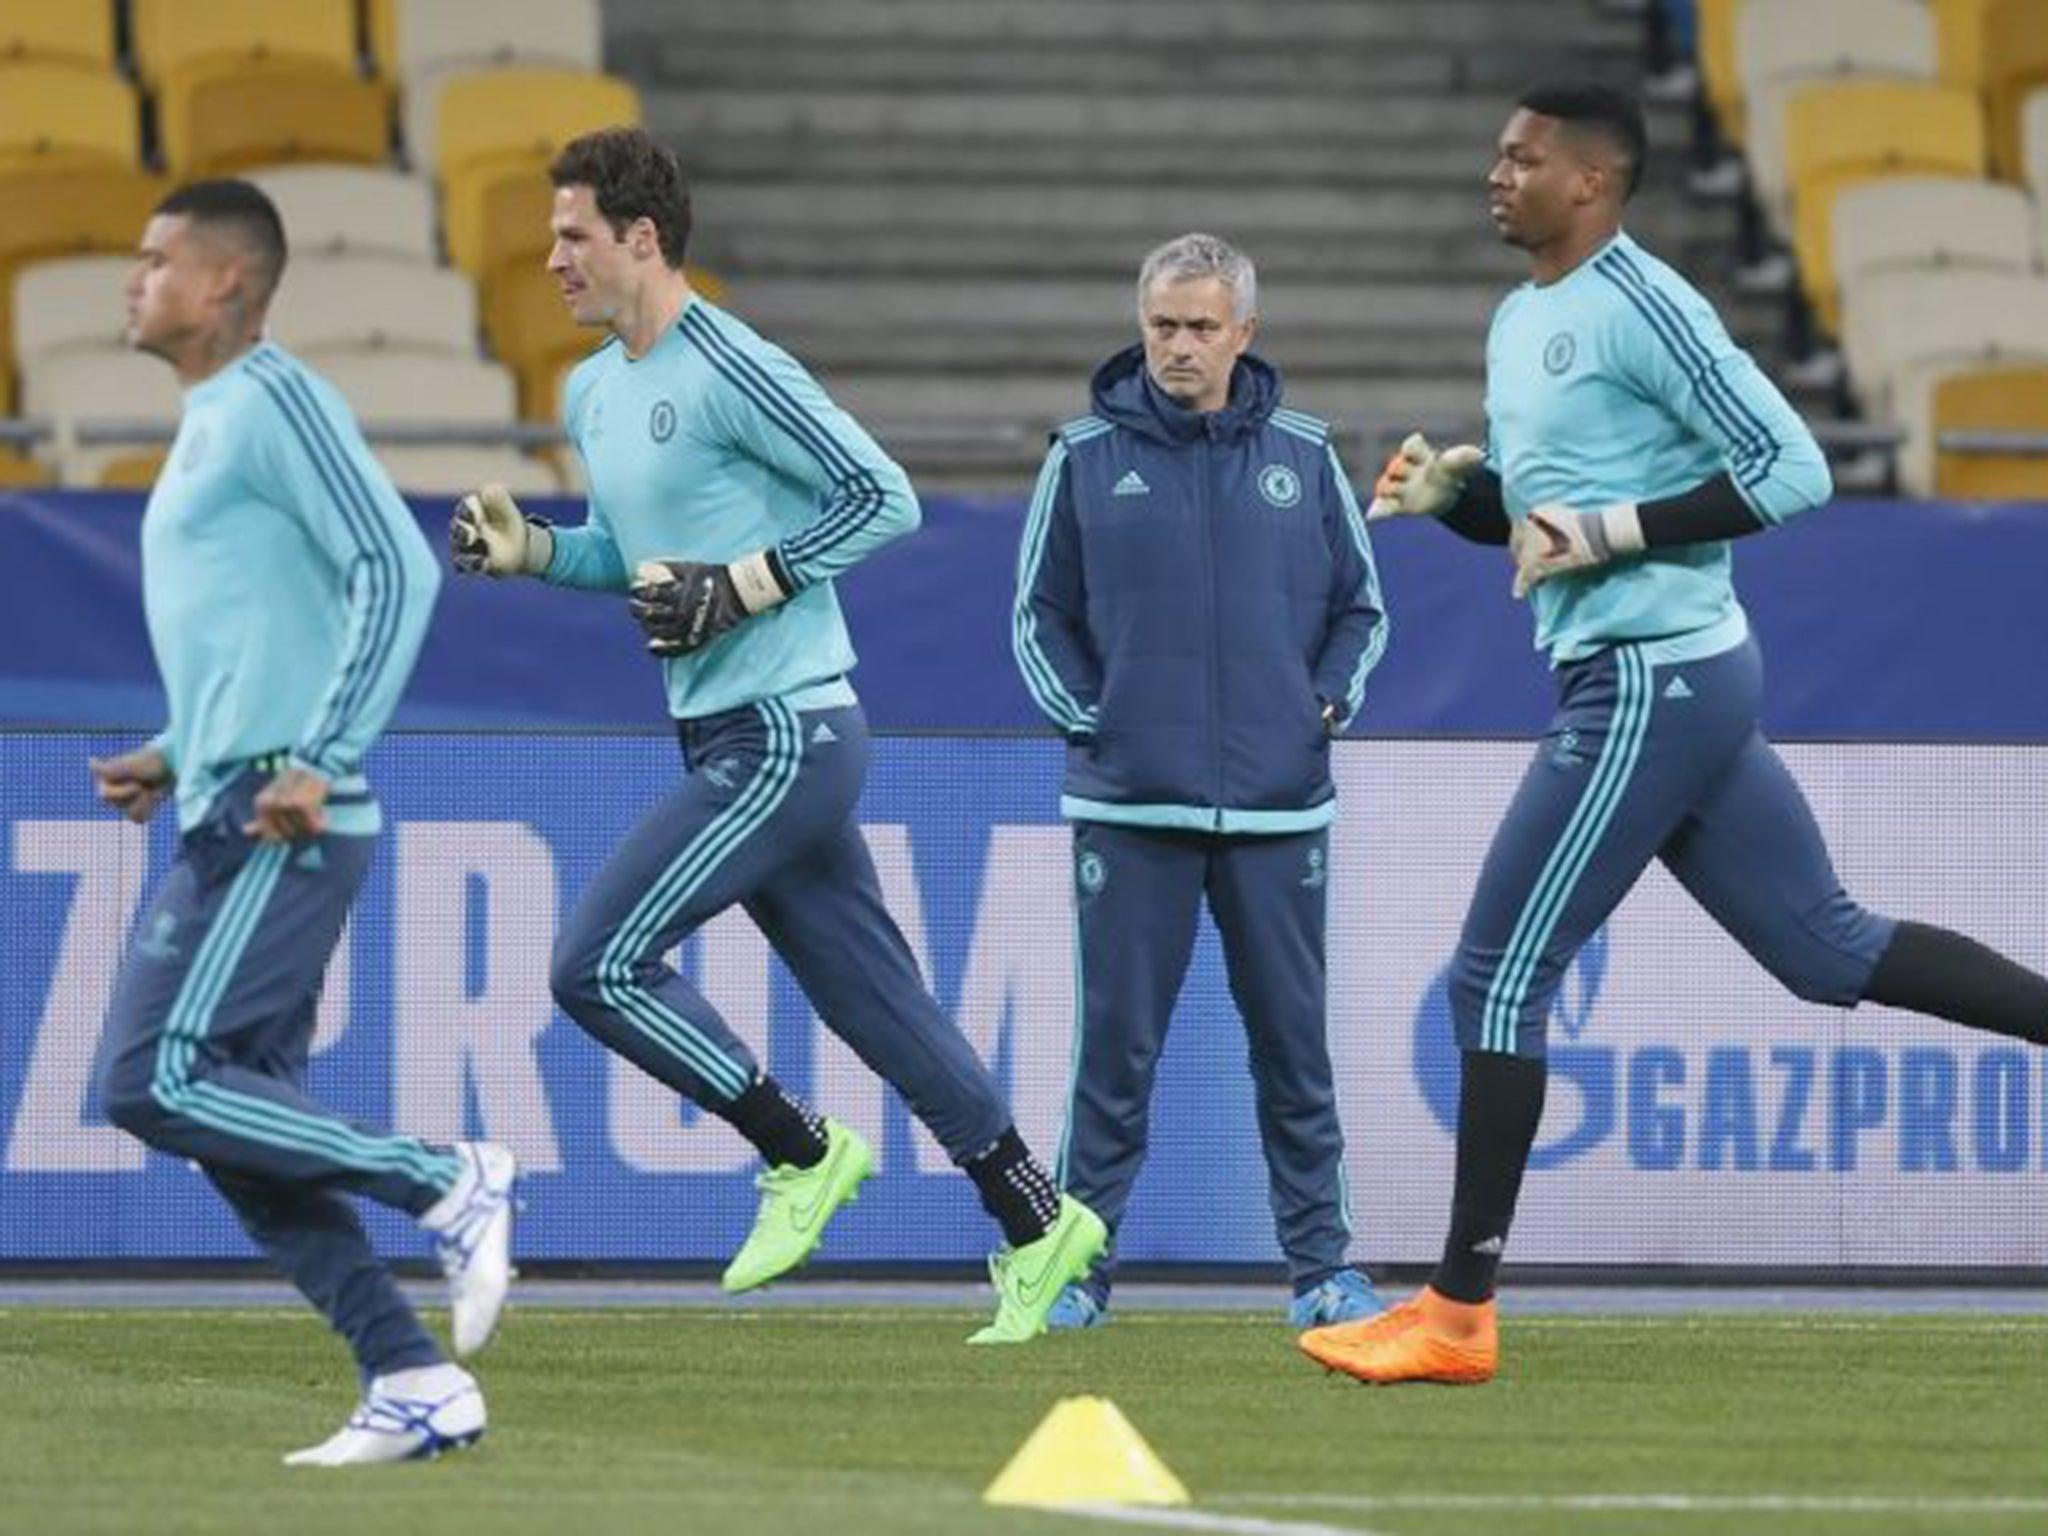 Dynamo Kyjev – Chelsea Facebook: Dynamo Kiev Vs Chelsea: Jose Mourinho Aims To Raise